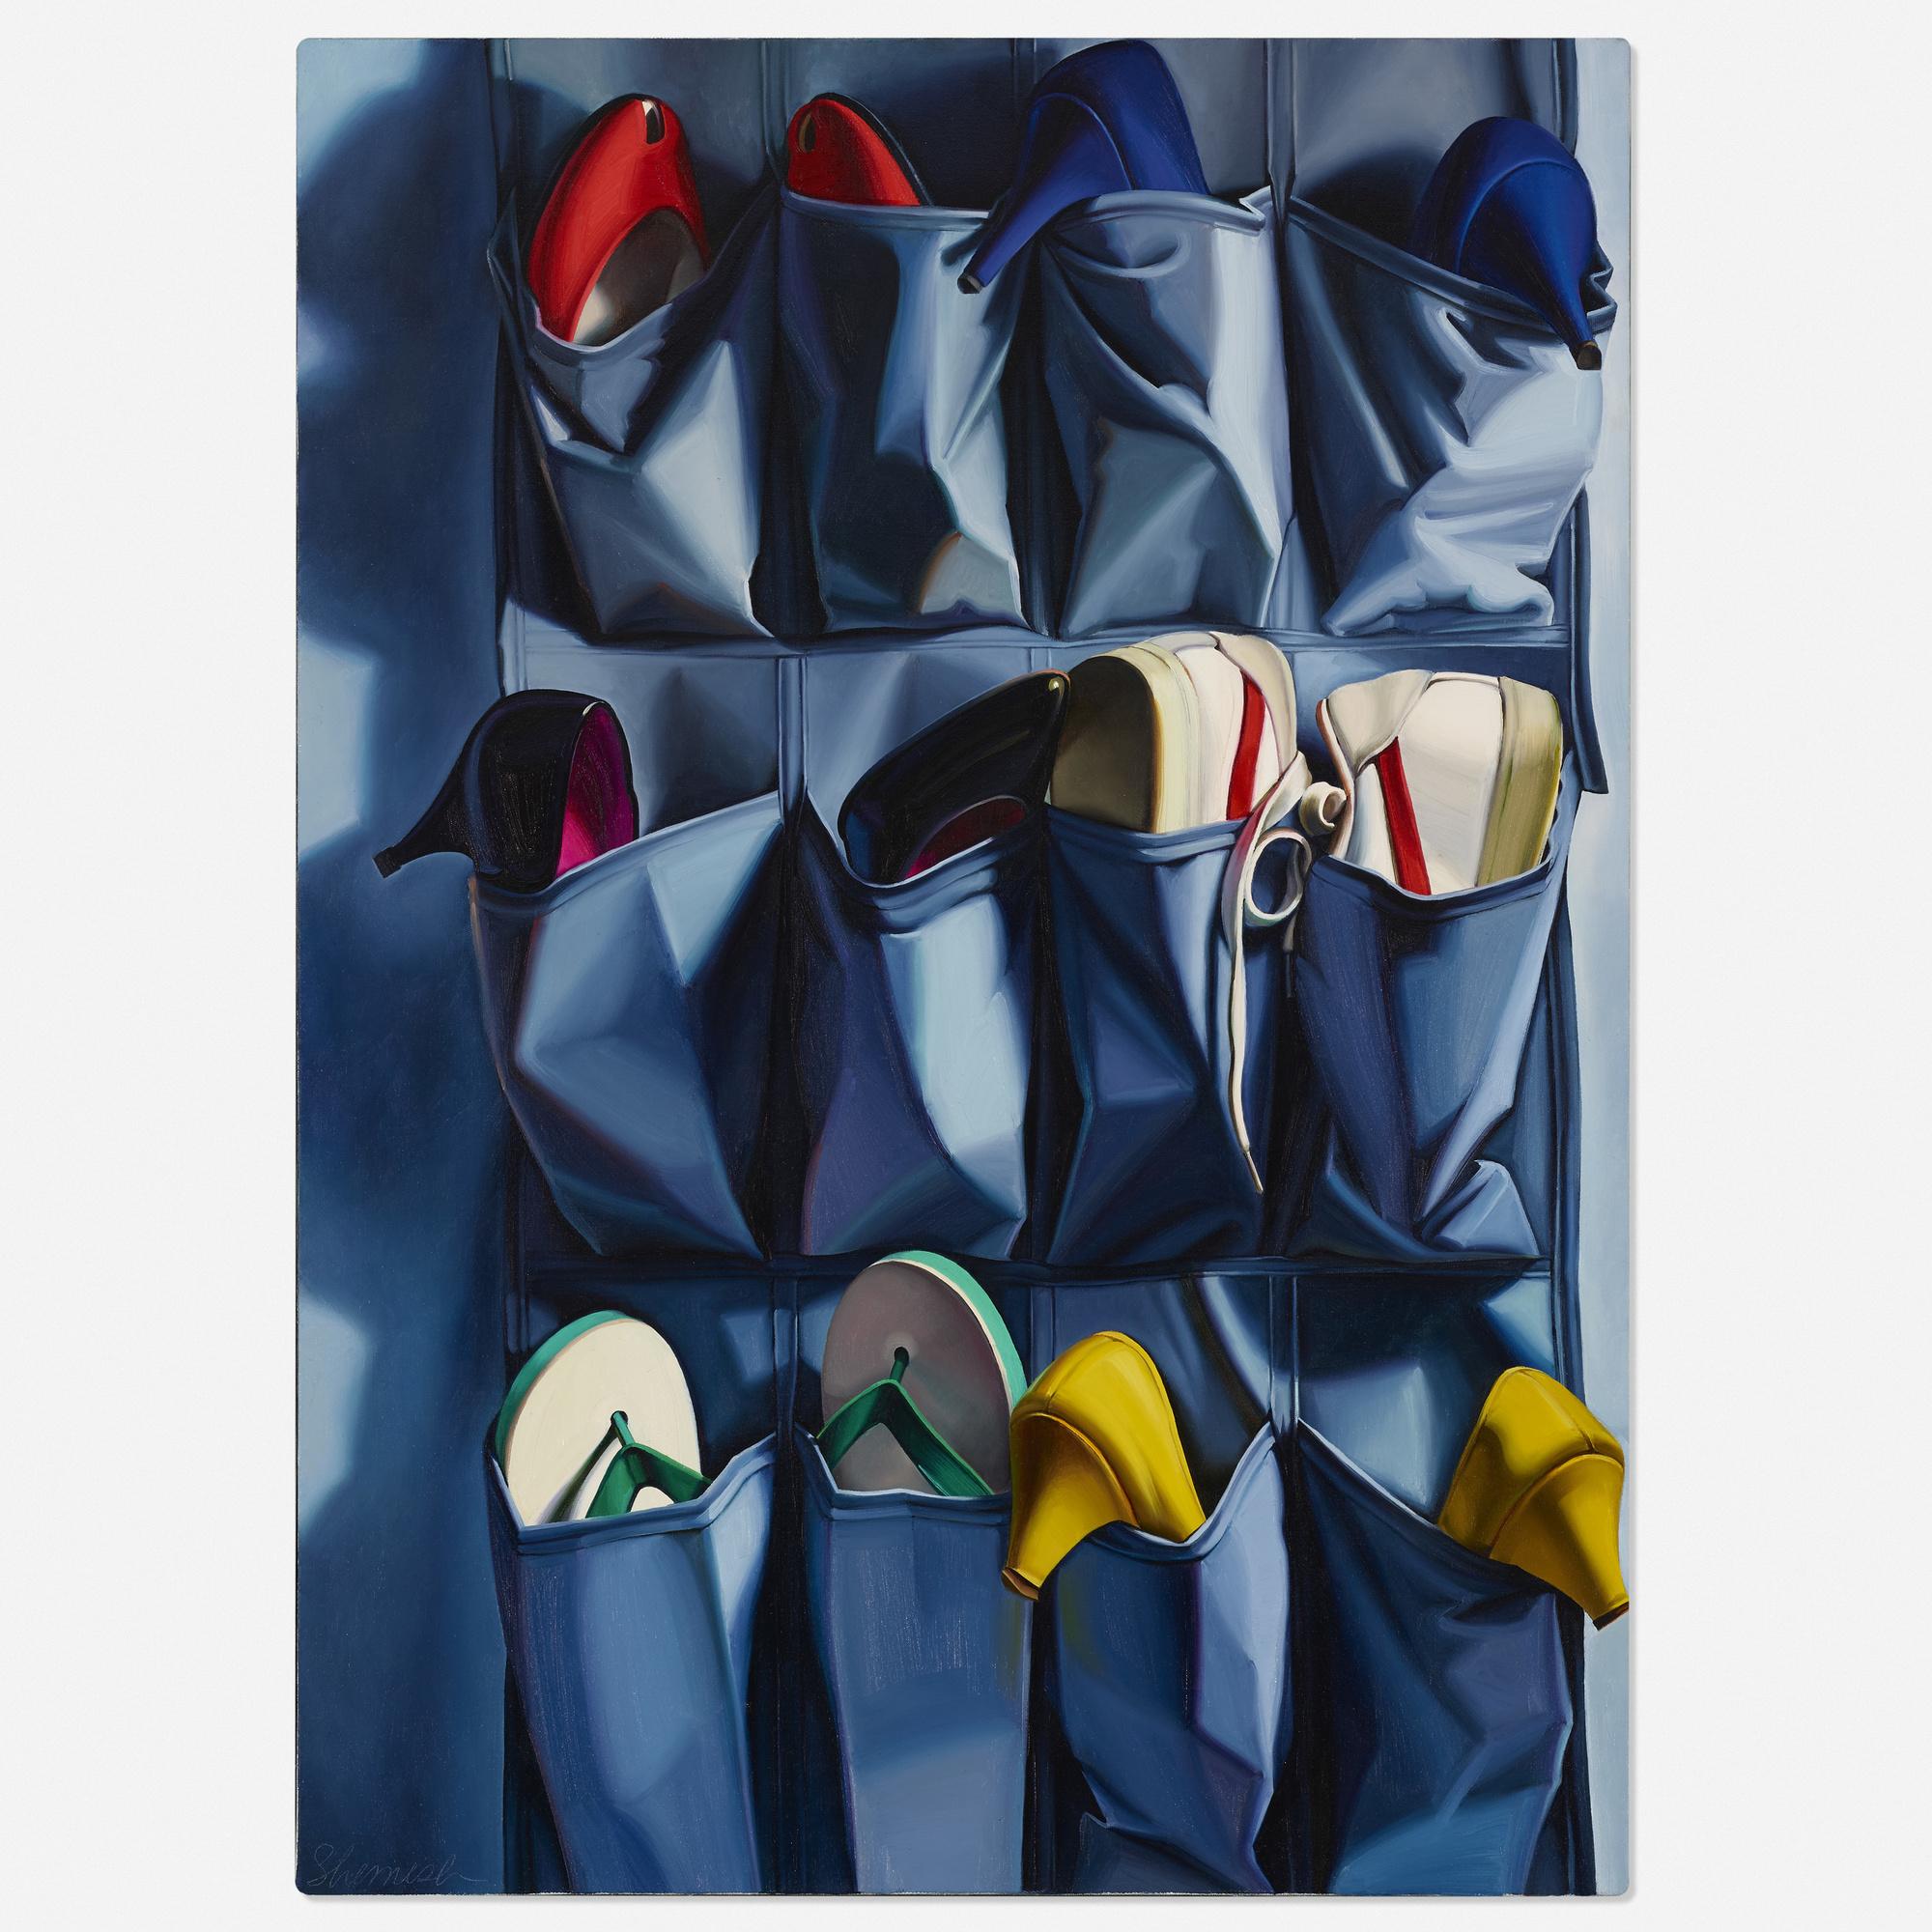 Lorraine Shemesh Art: 193: LORRAINE SHEMESH, Shoebag